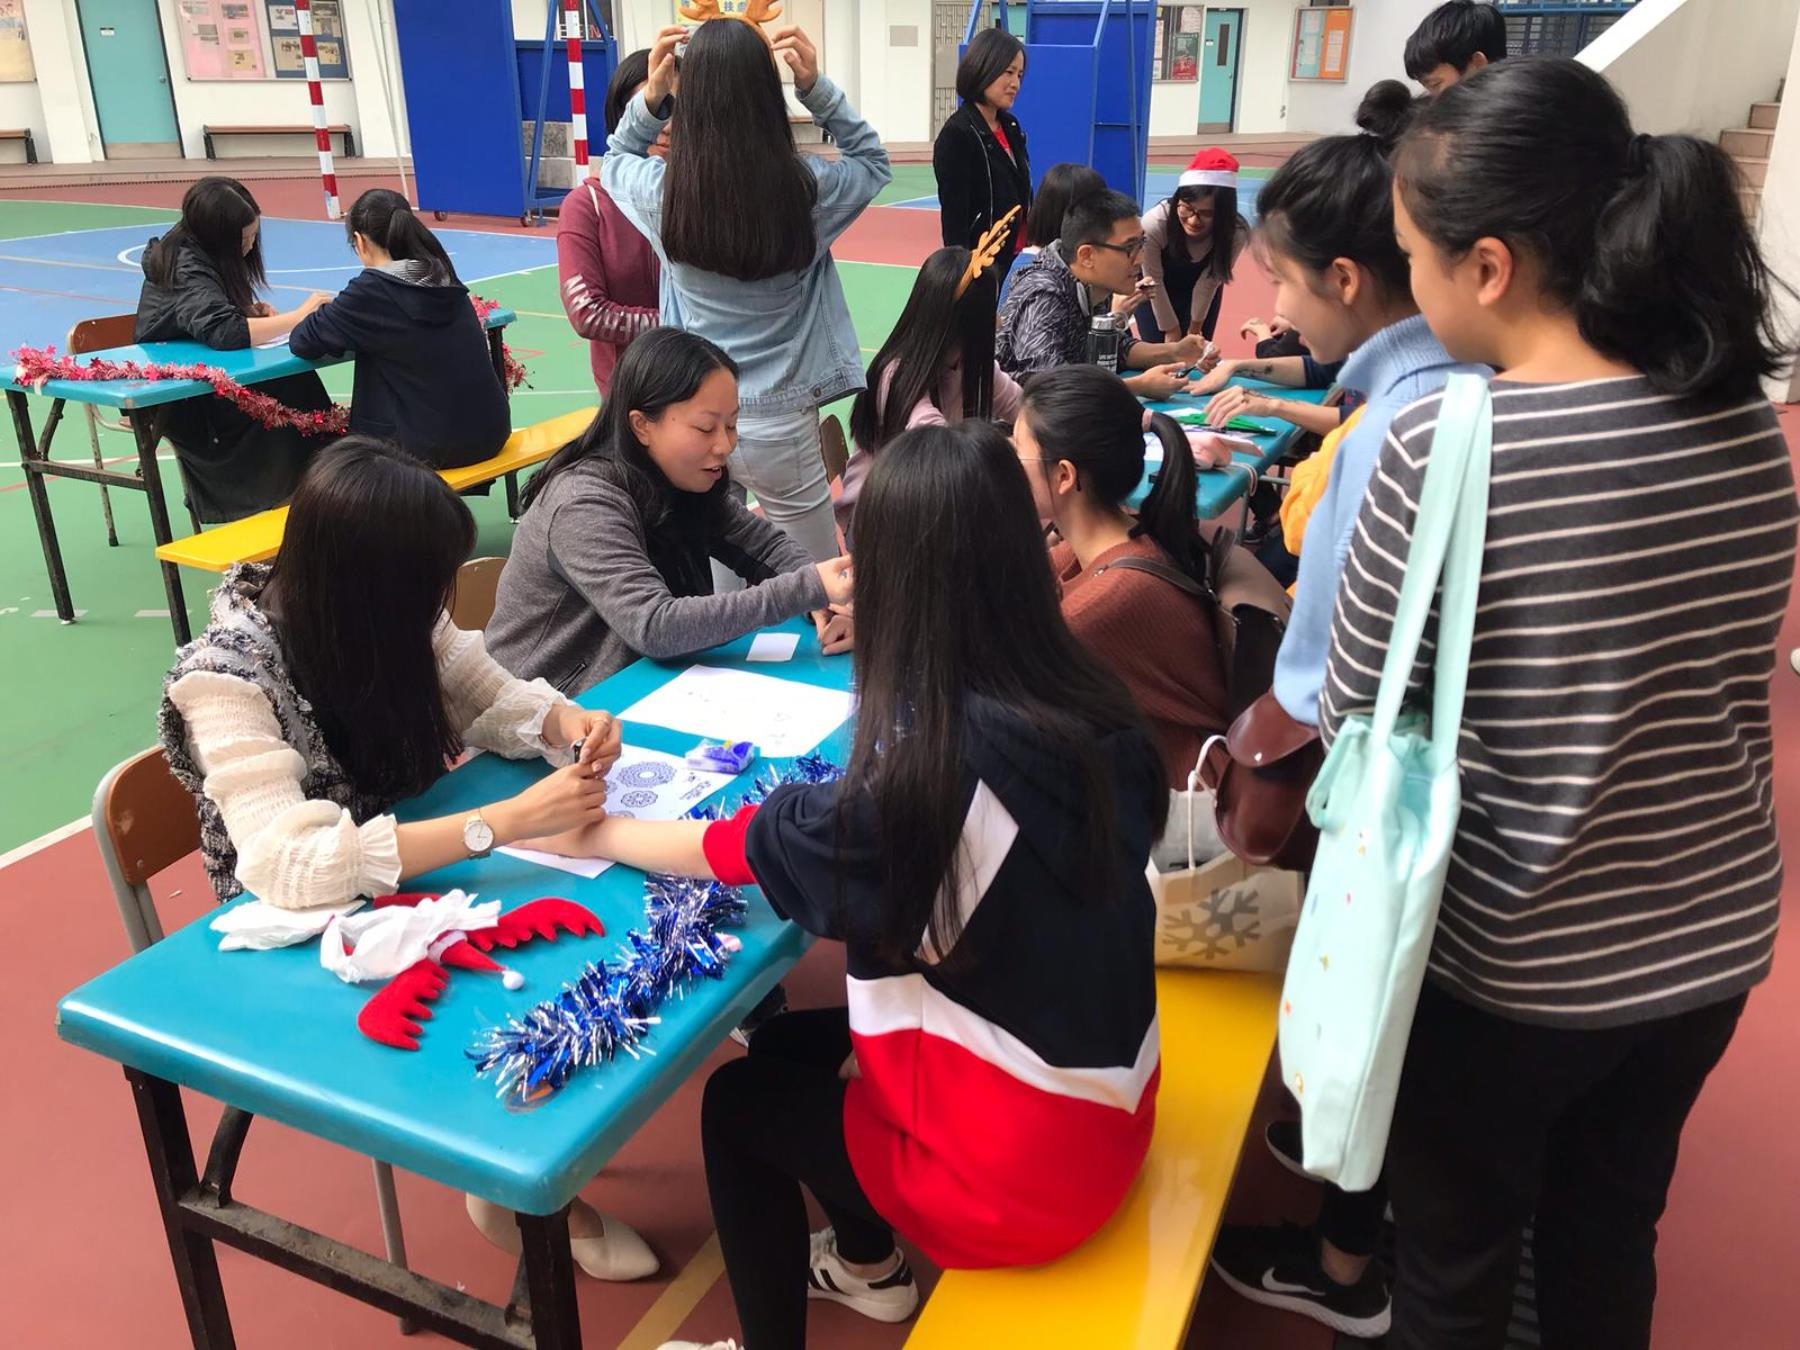 https://npc.edu.hk/sites/default/files/img-20190102-wa0000_1.jpg